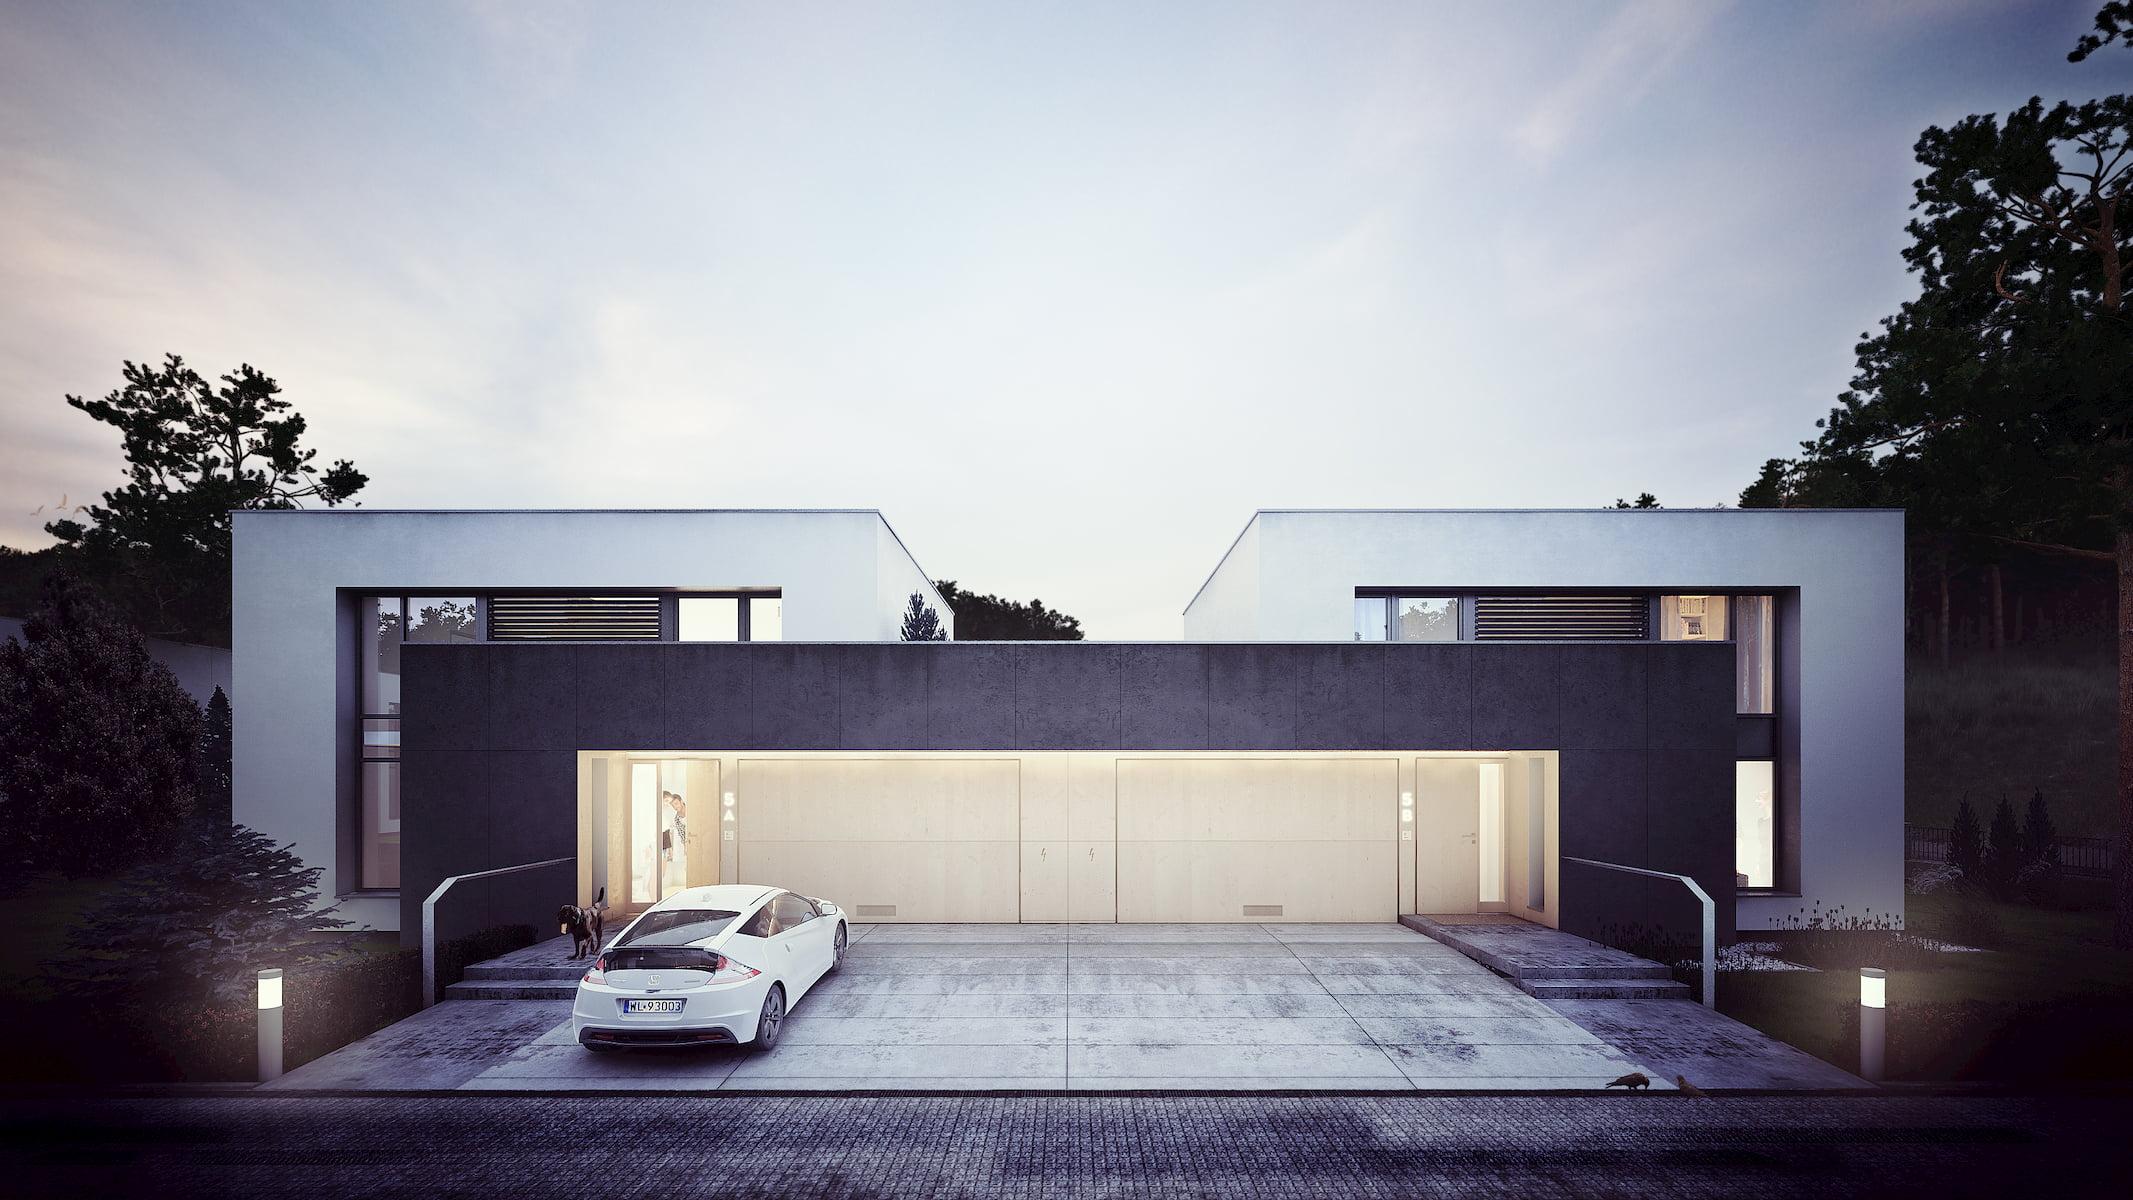 CUBUS house Simple Architecture 2014